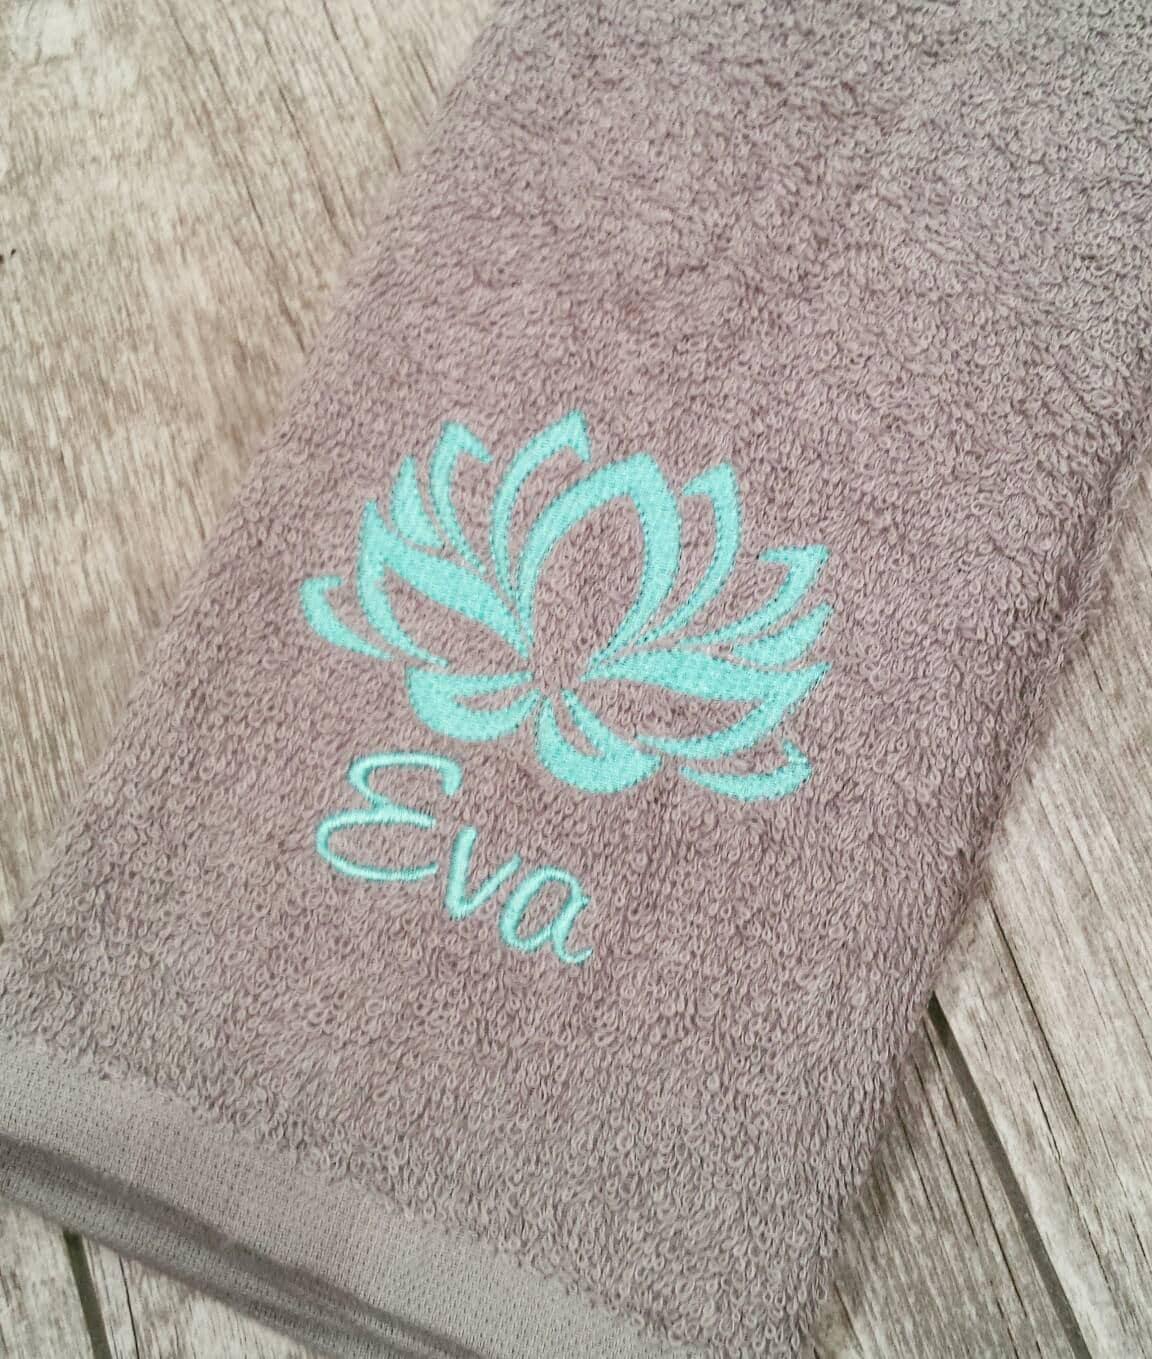 Personalized Sweat Towel: Personalized Lotus Sweat Towel Gym Towel Sports Towel